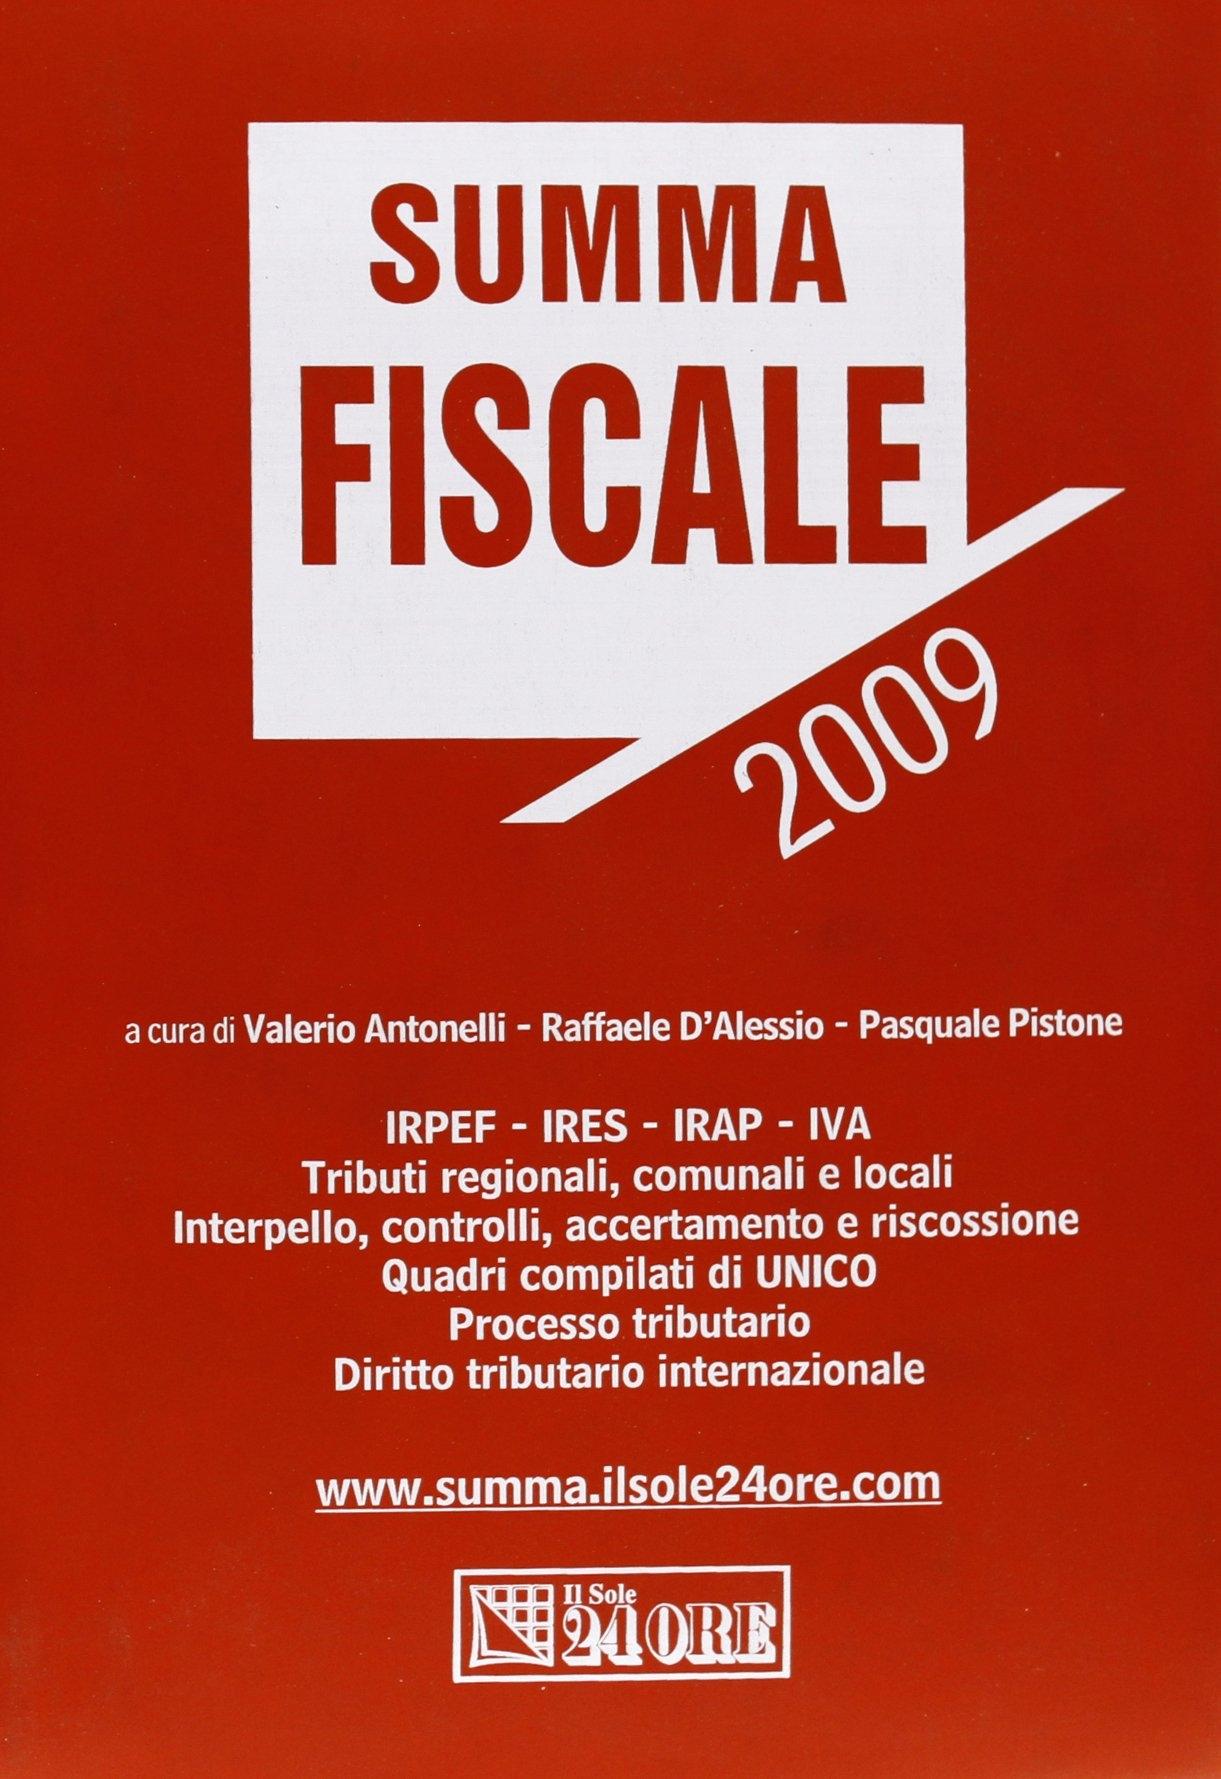 Summa fiscale 2009